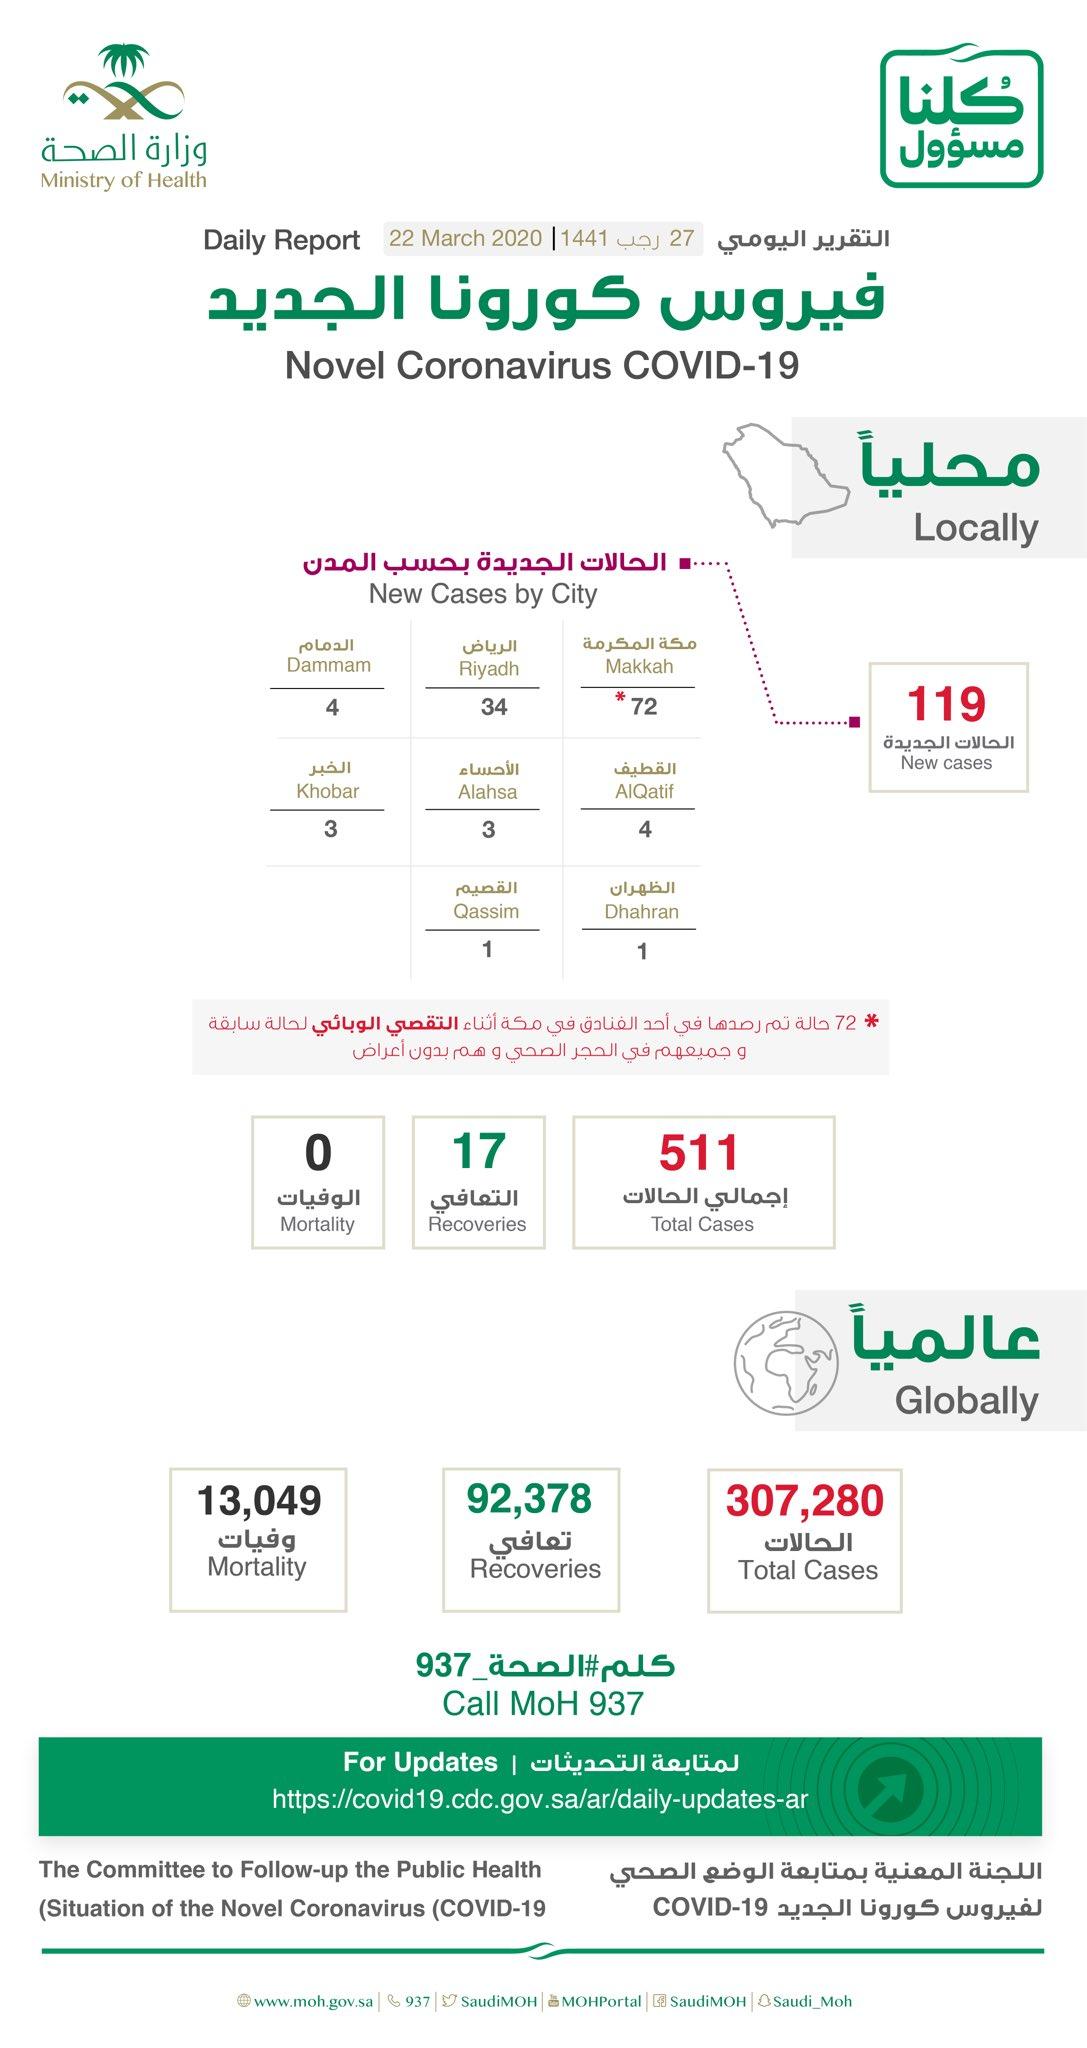 Saudi Arabia announced 119 new Coronavirus cases - Total 511